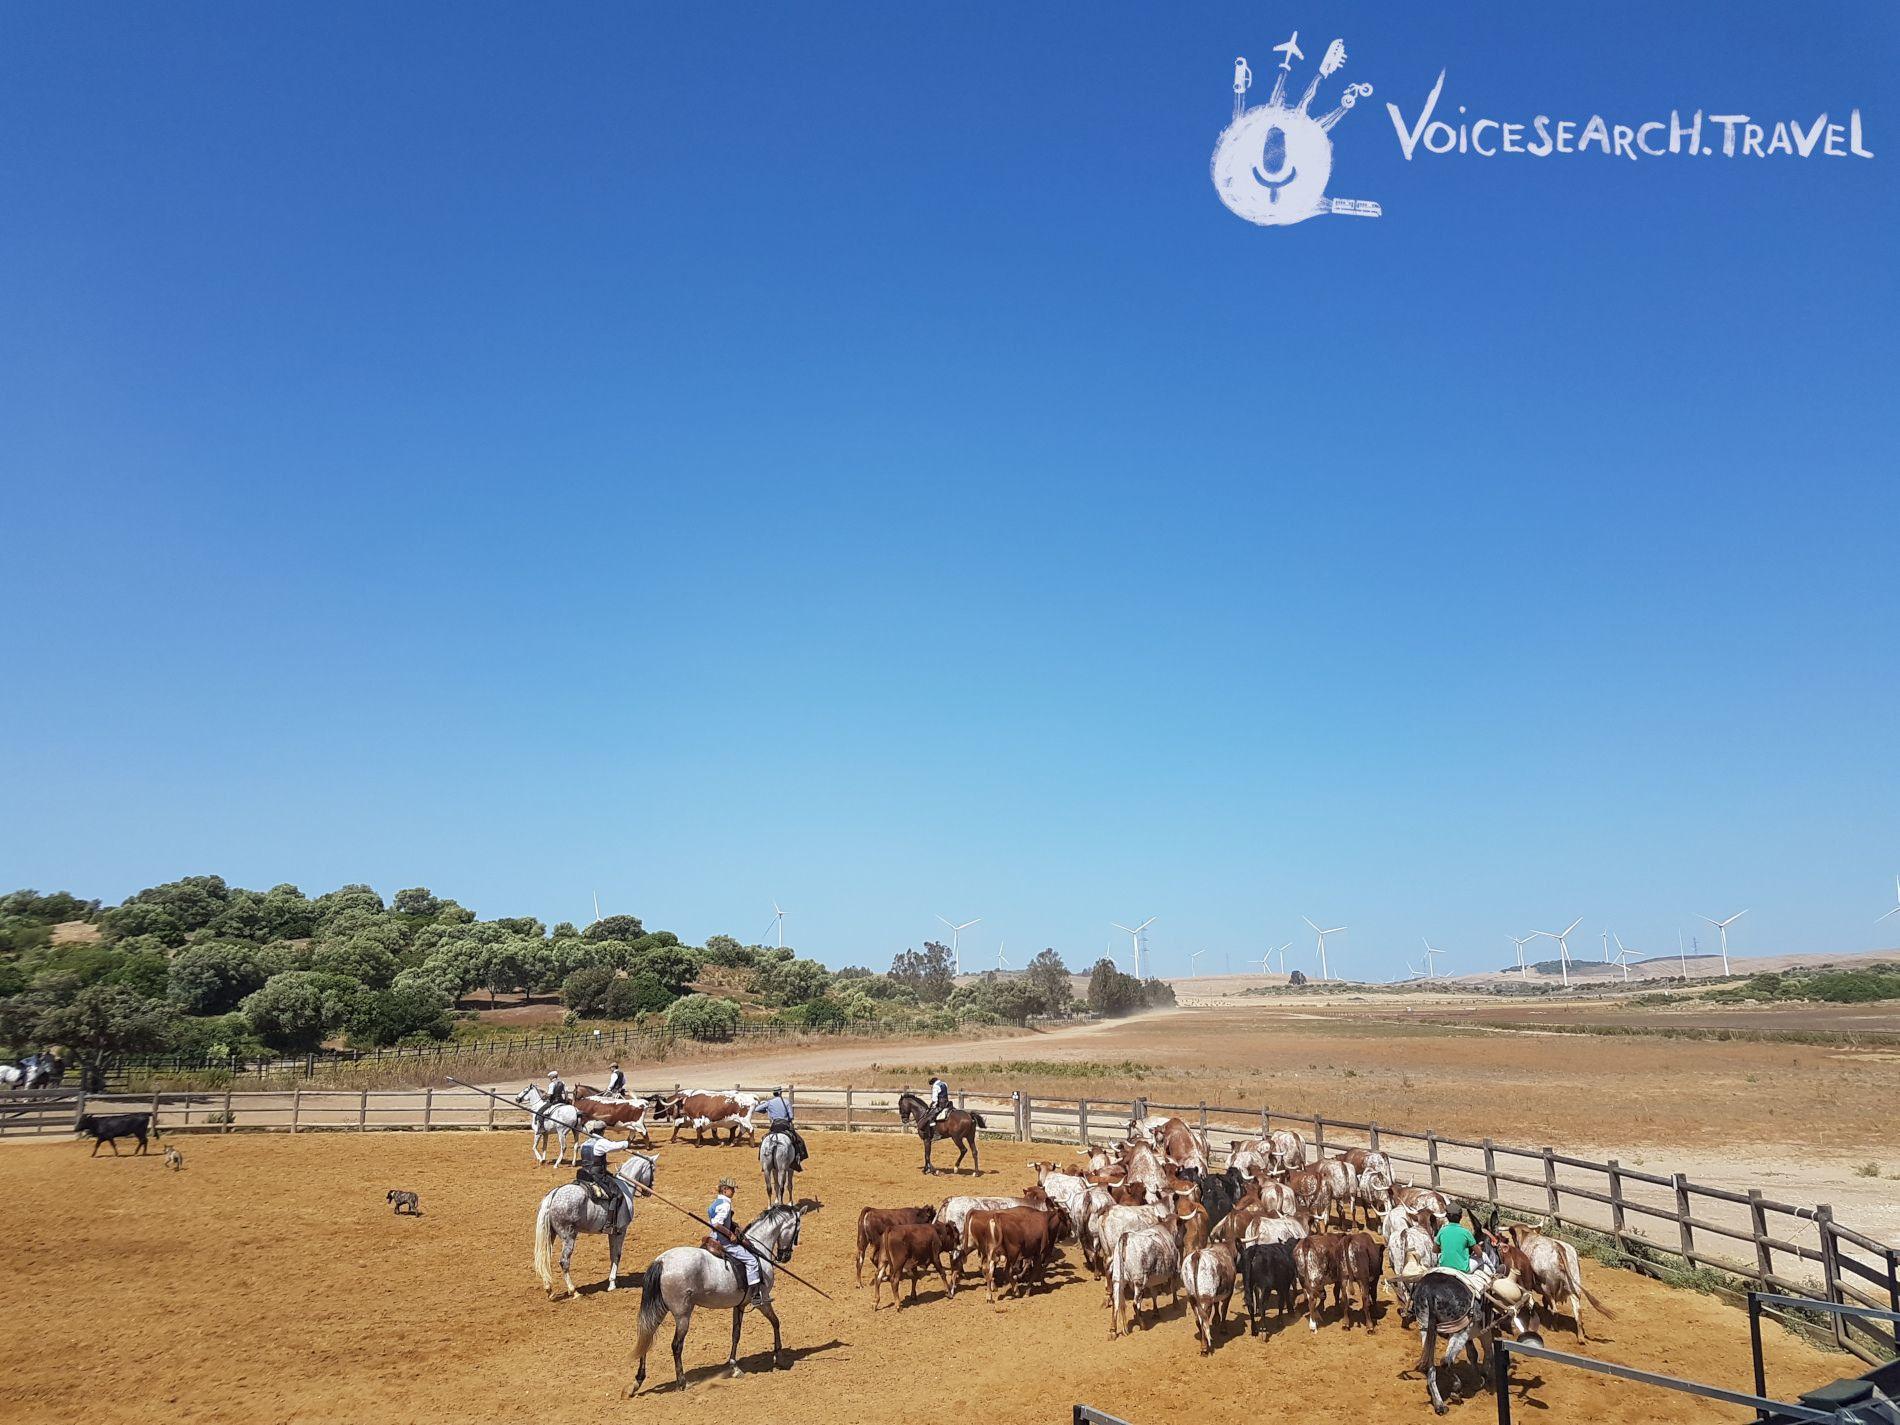 Spettcolo cavalli e tori andalusi a Medina-Sidonia